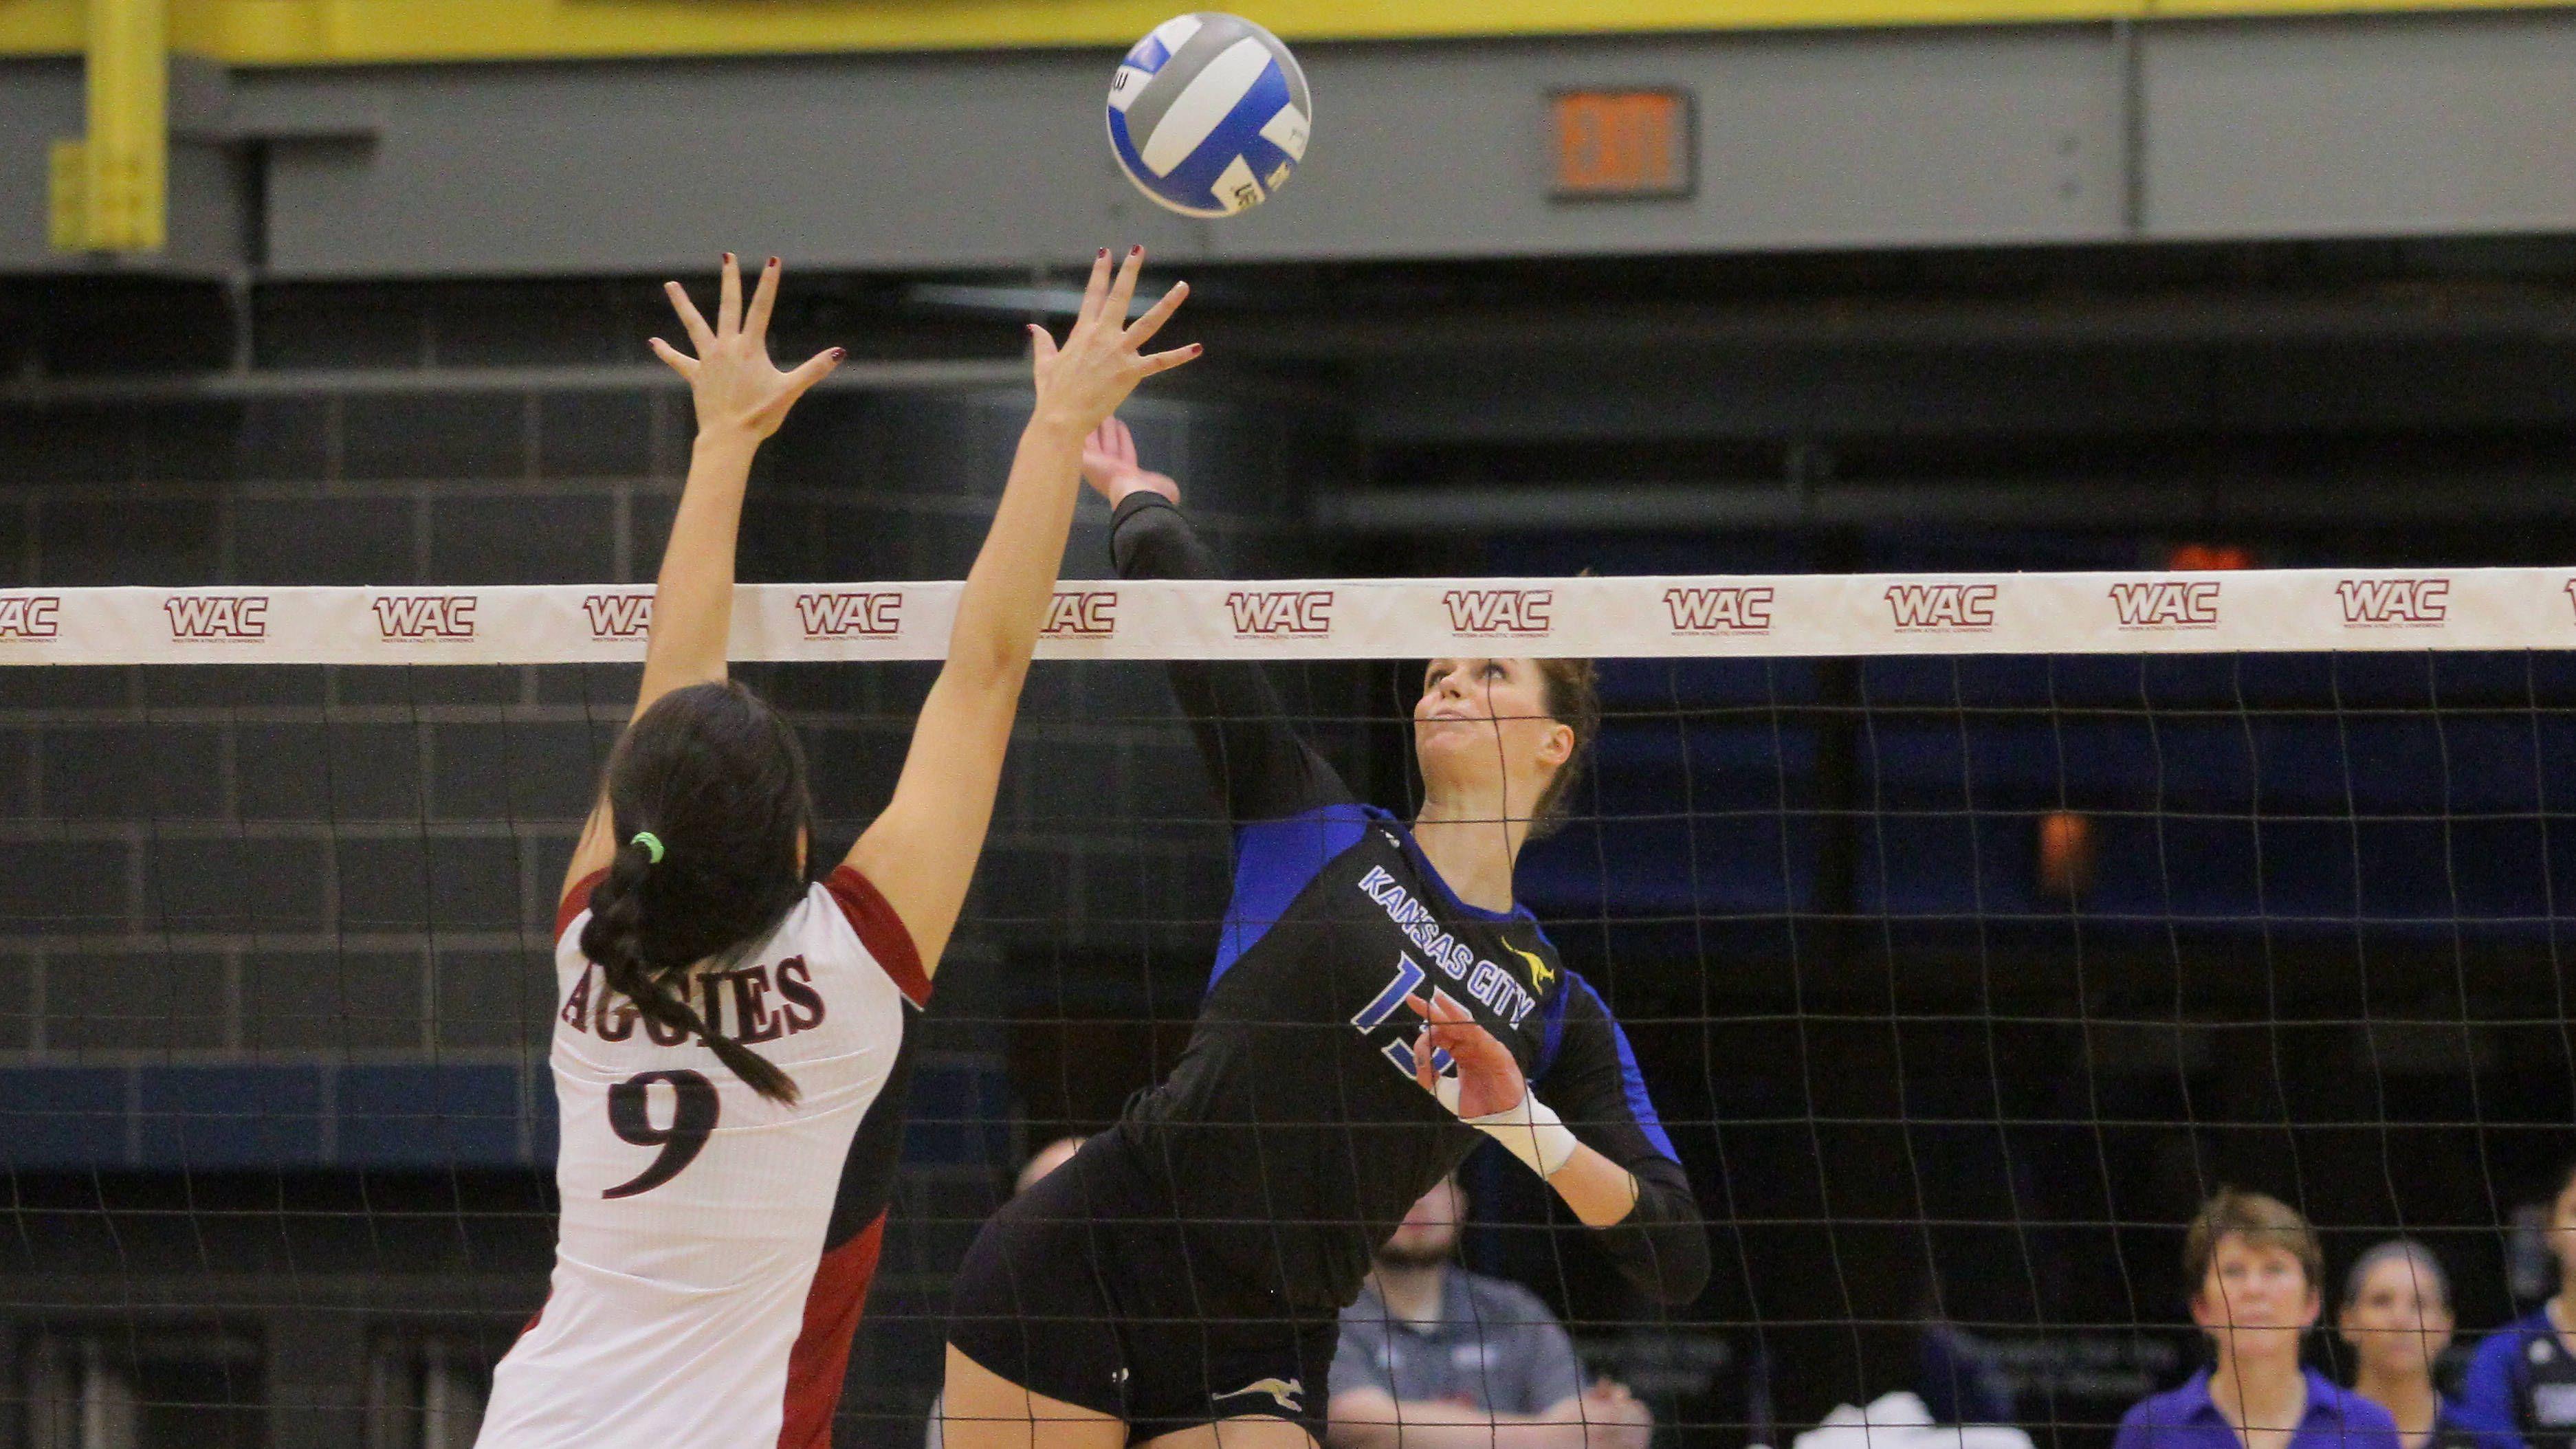 Roos Season Comes To A Close In Wac Semis Umkc Athletics Volleyball News Athlete Seasons